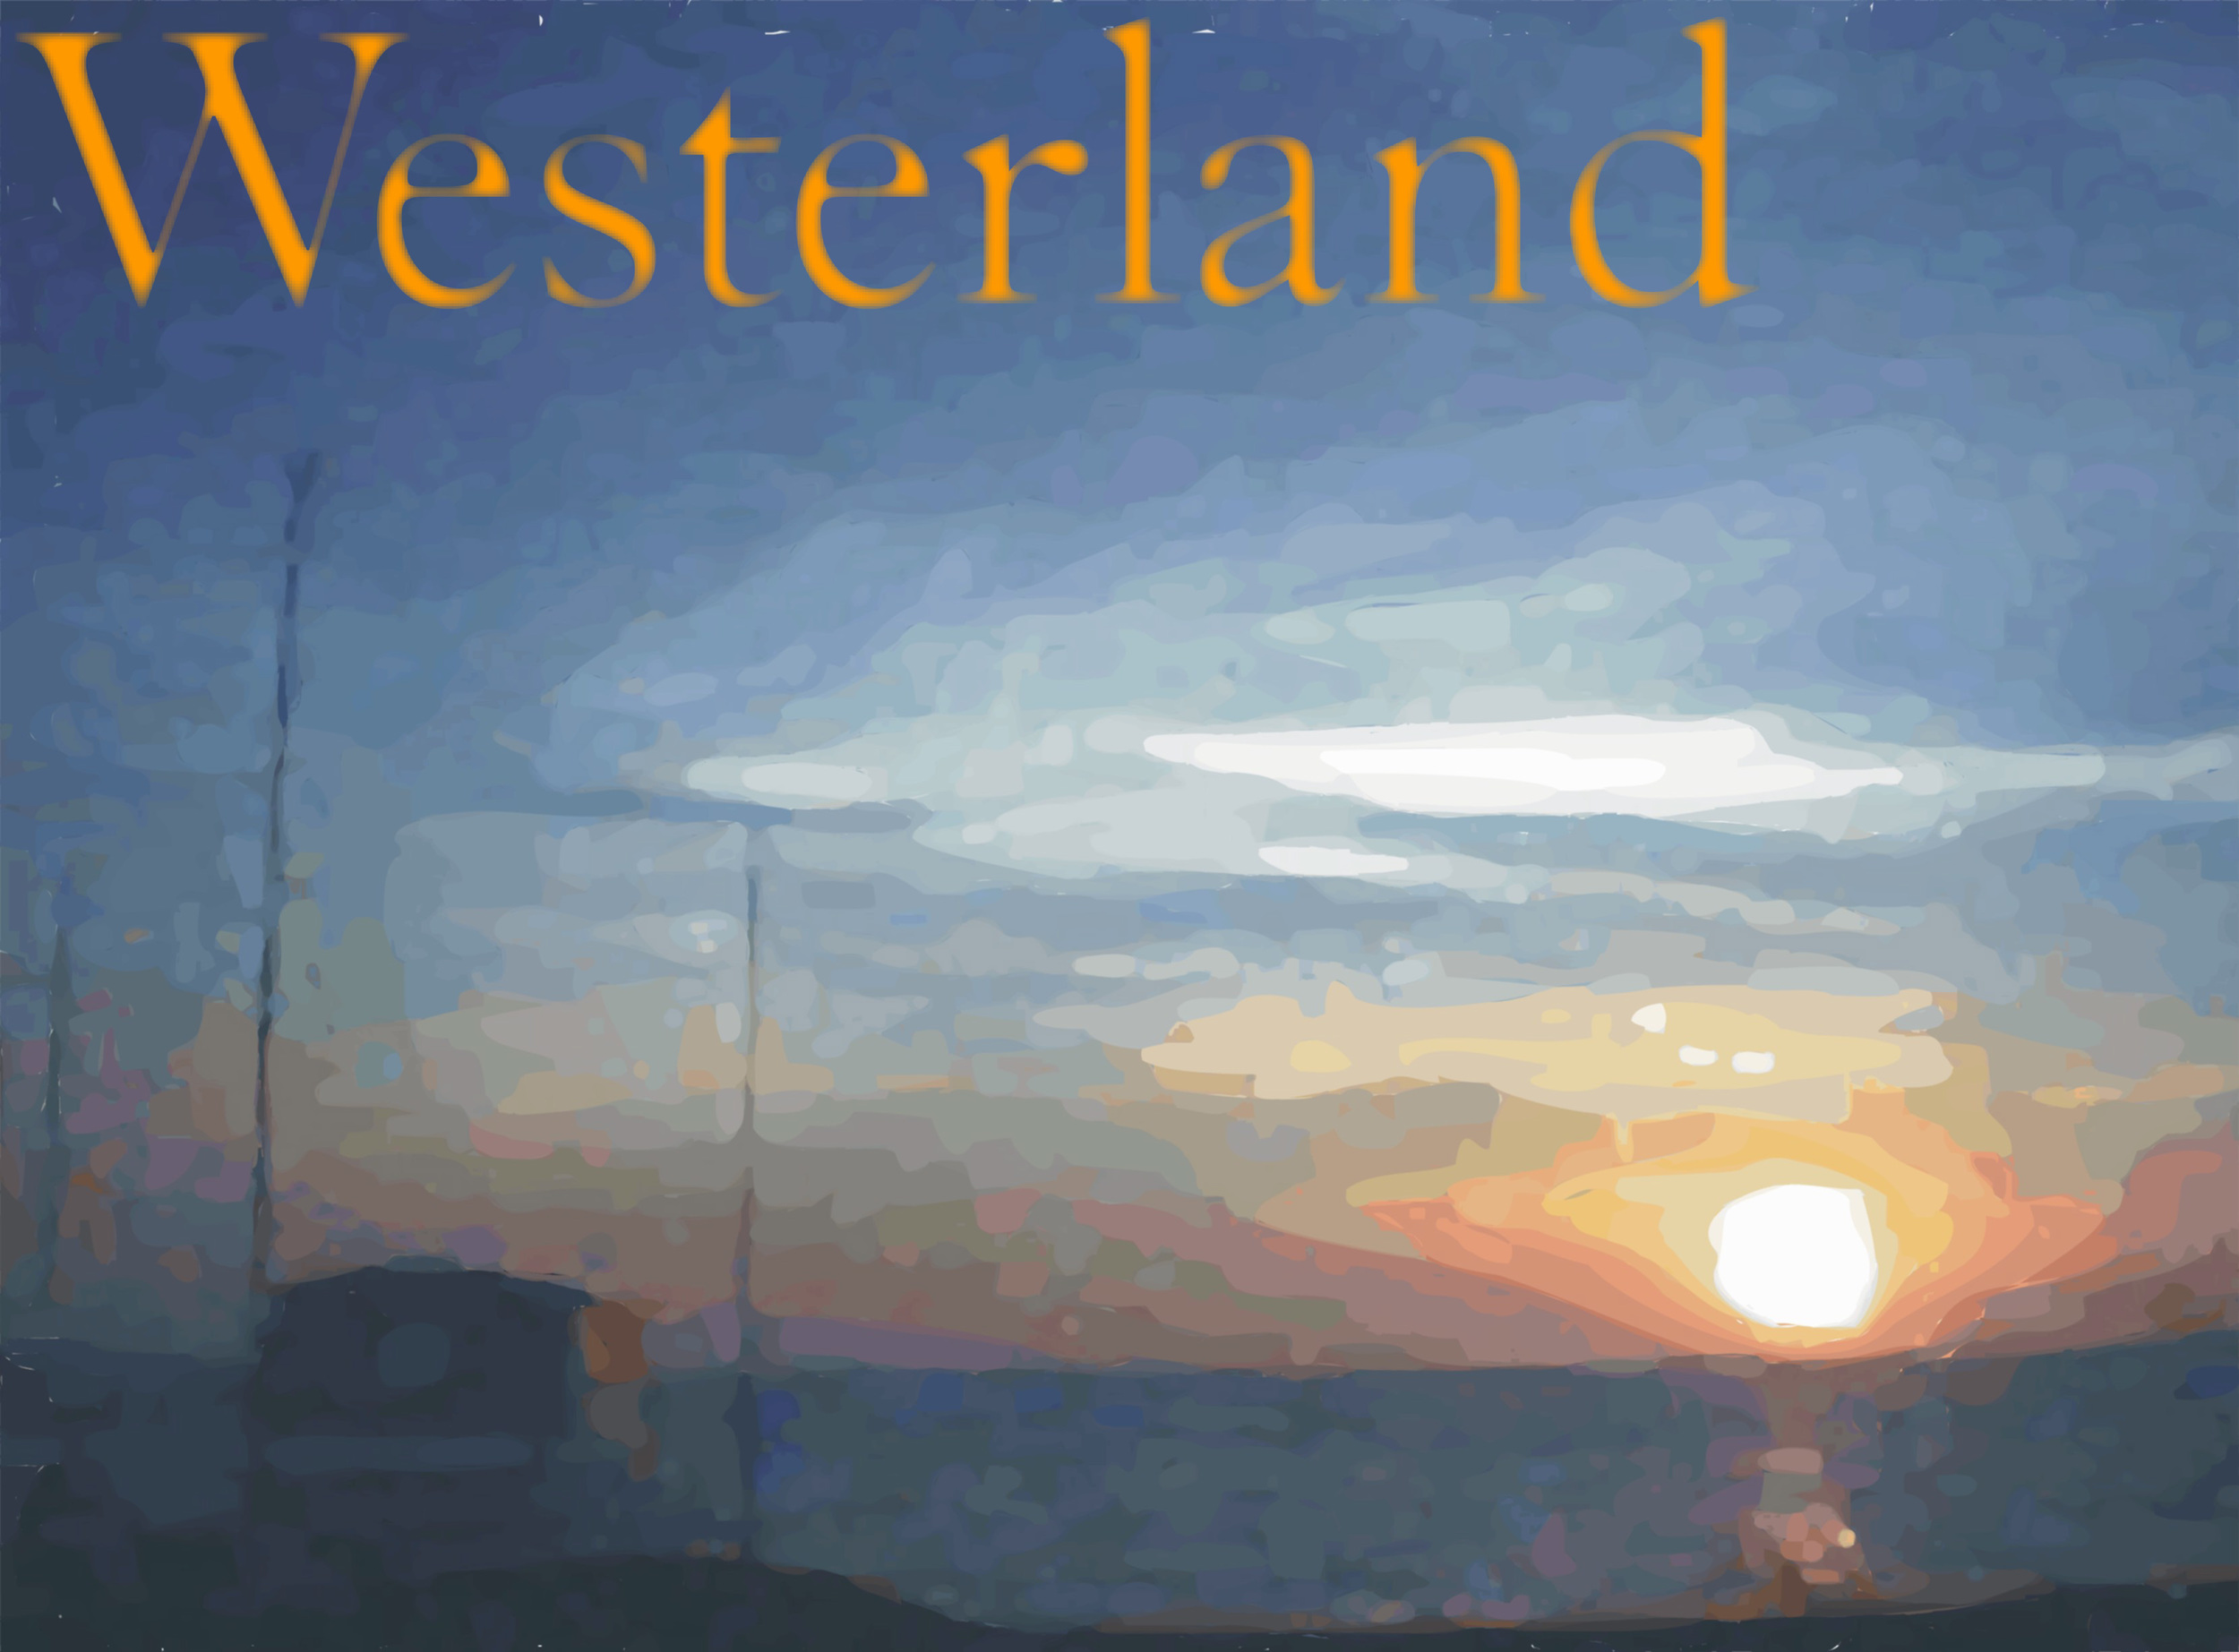 westerland.jpg